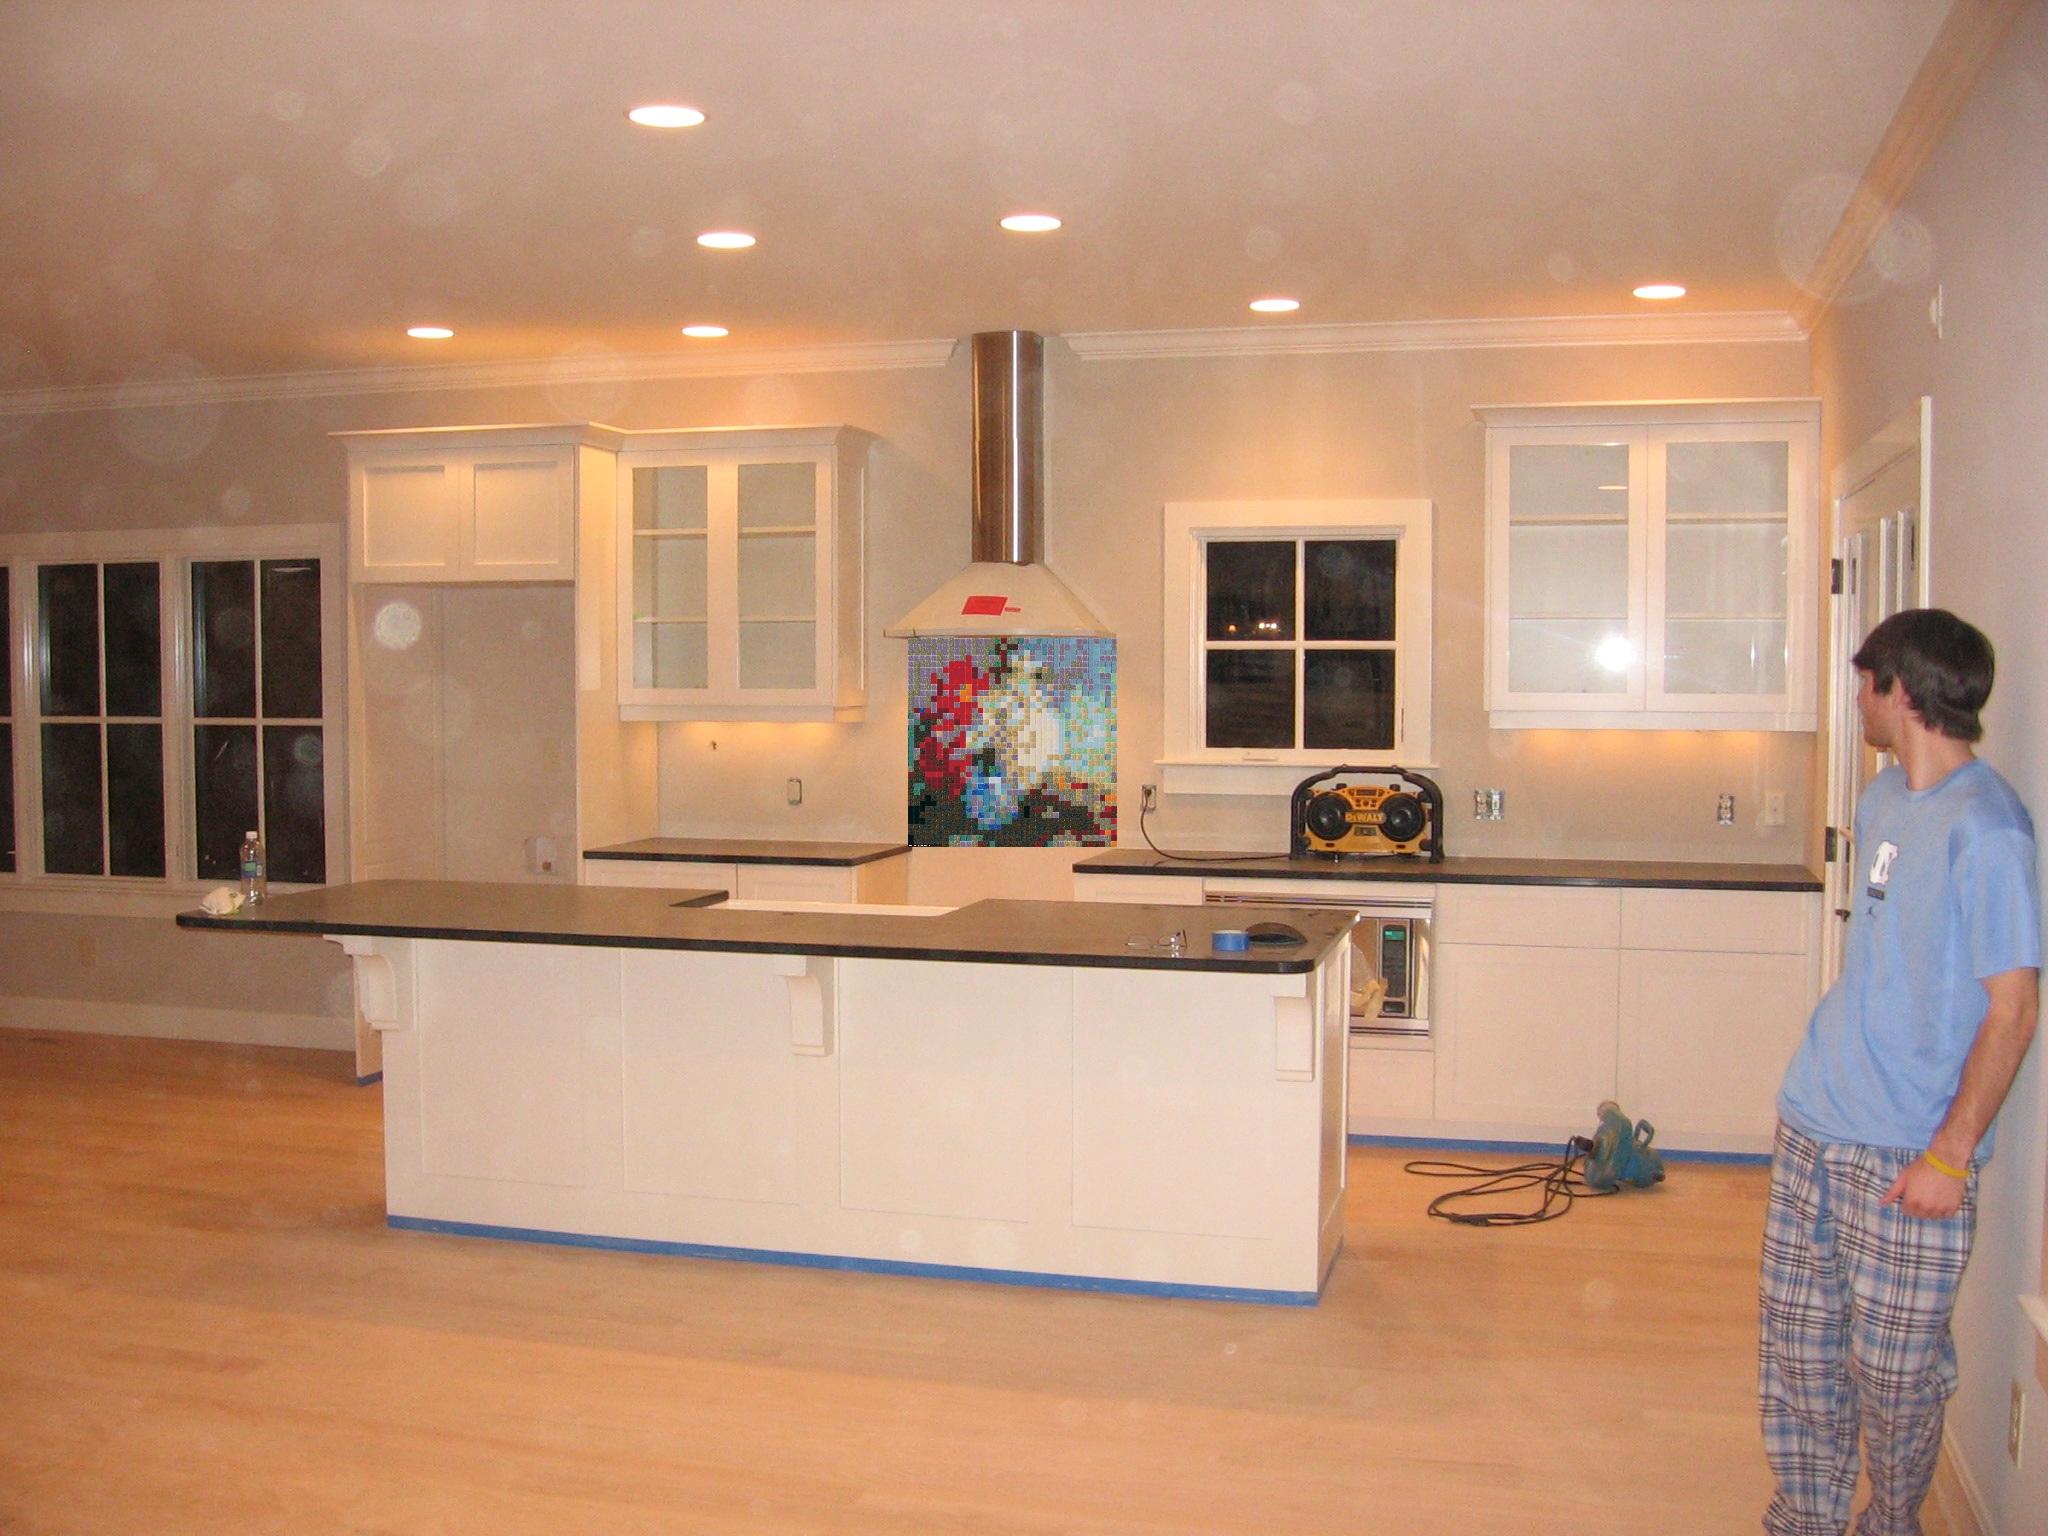 b_kitchen_final-peonies.JPG